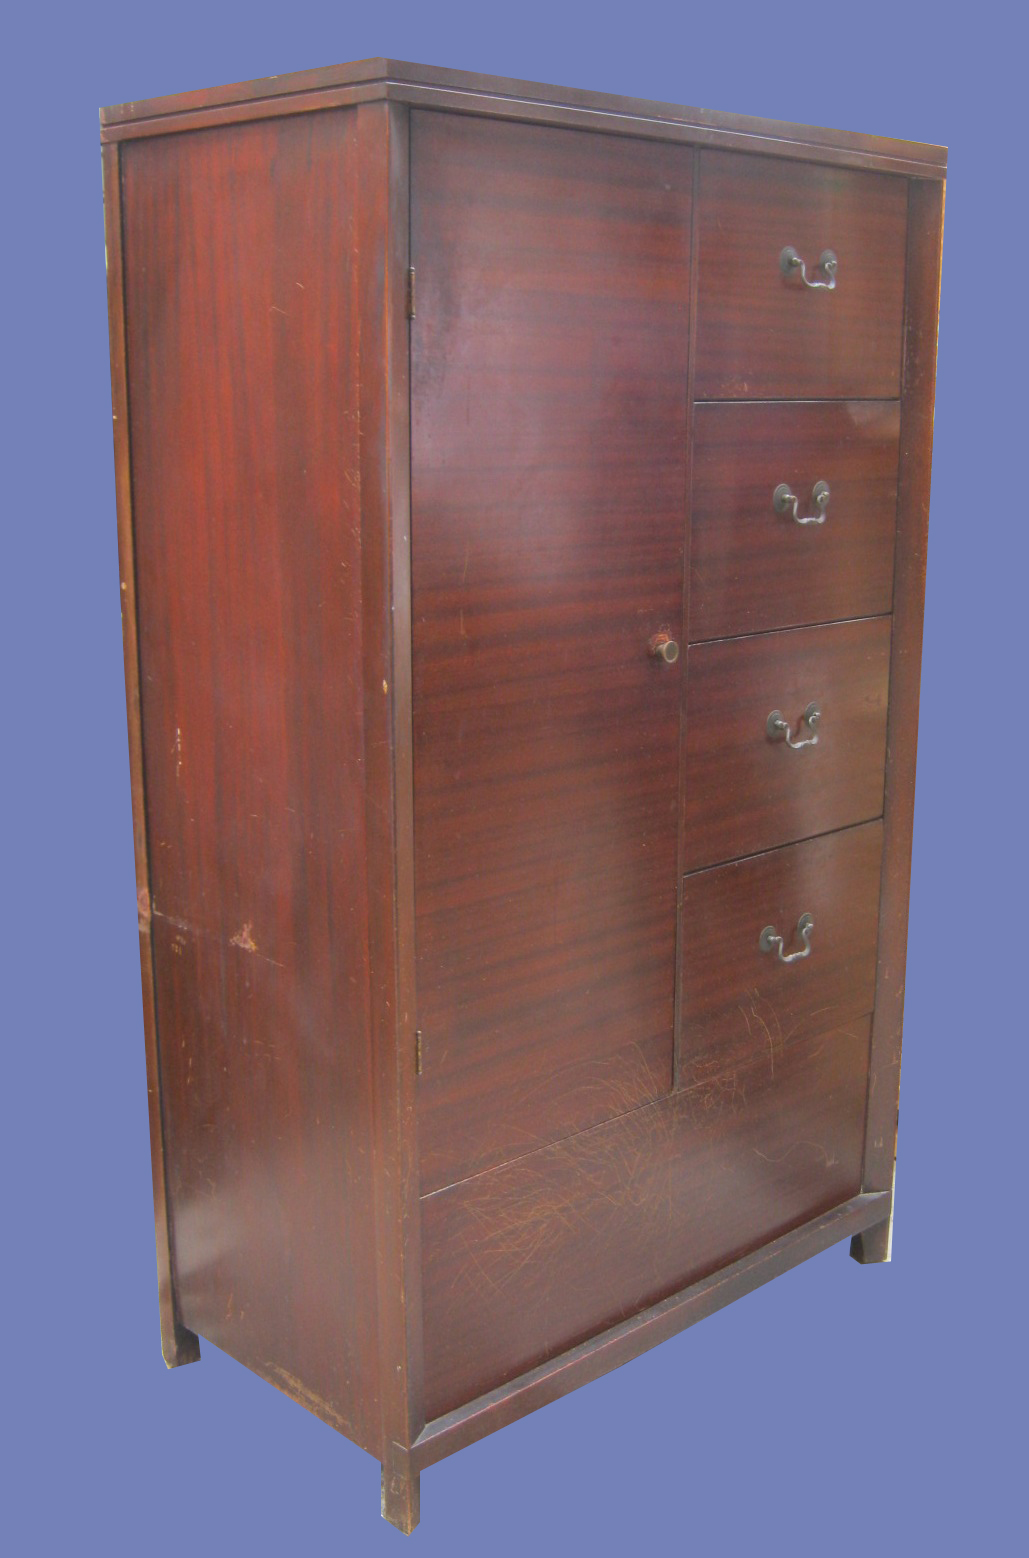 Uhuru Furniture Amp Collectibles Vintage Chiffarobe SOLD